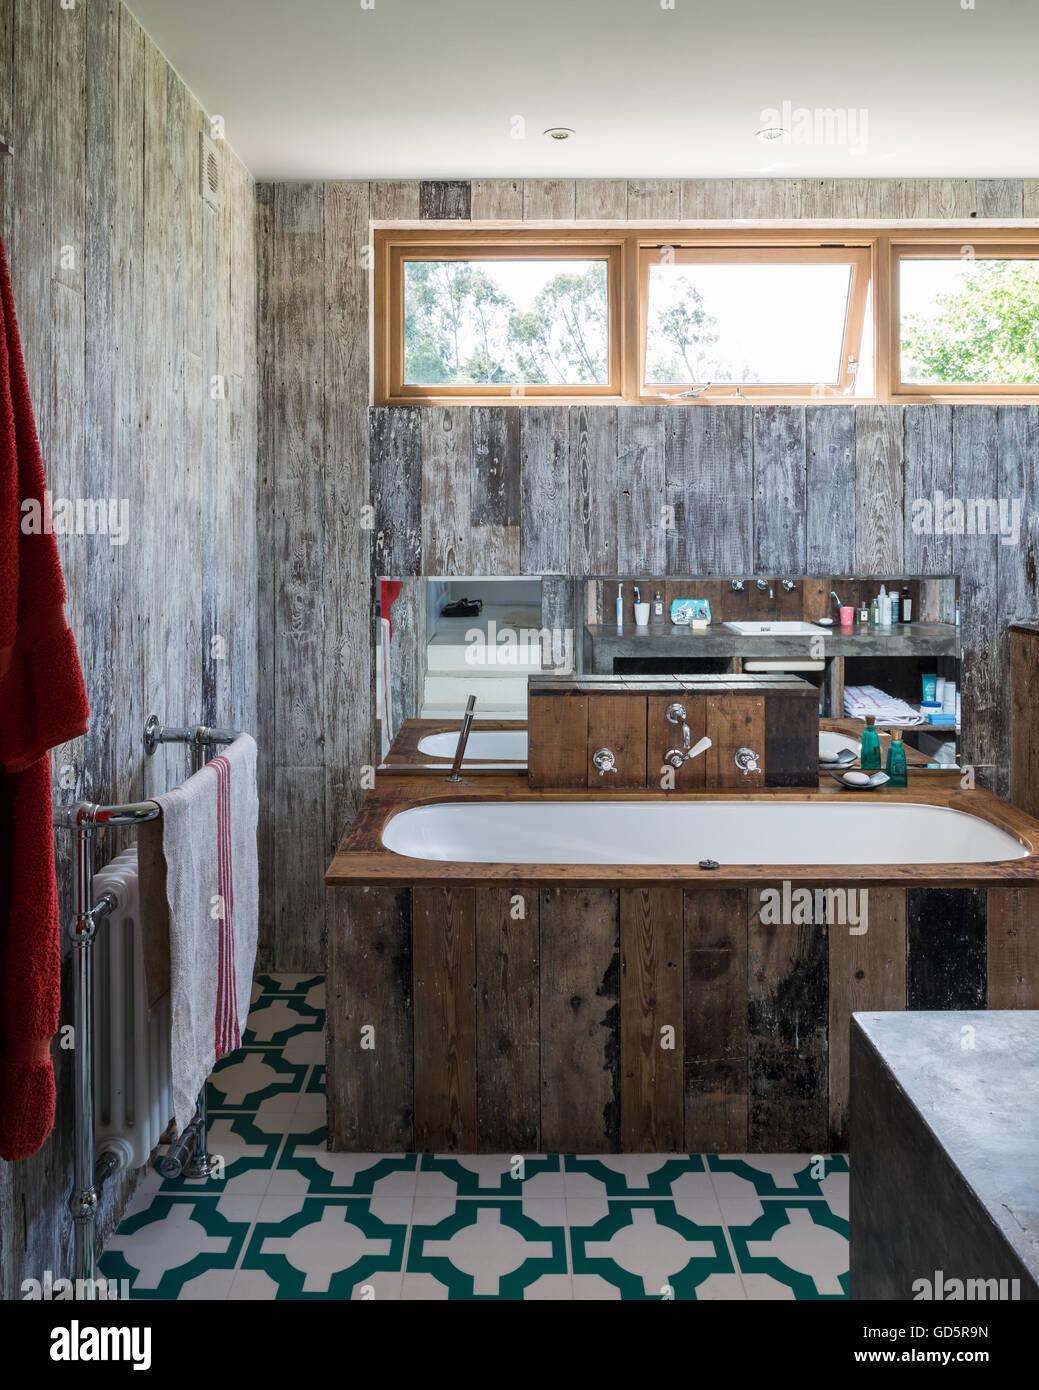 Bath tub clad in recycled floorboards in bathroom with Parquet Turquoise vinyl floor tiles by Neisha Crosland - Stock Image